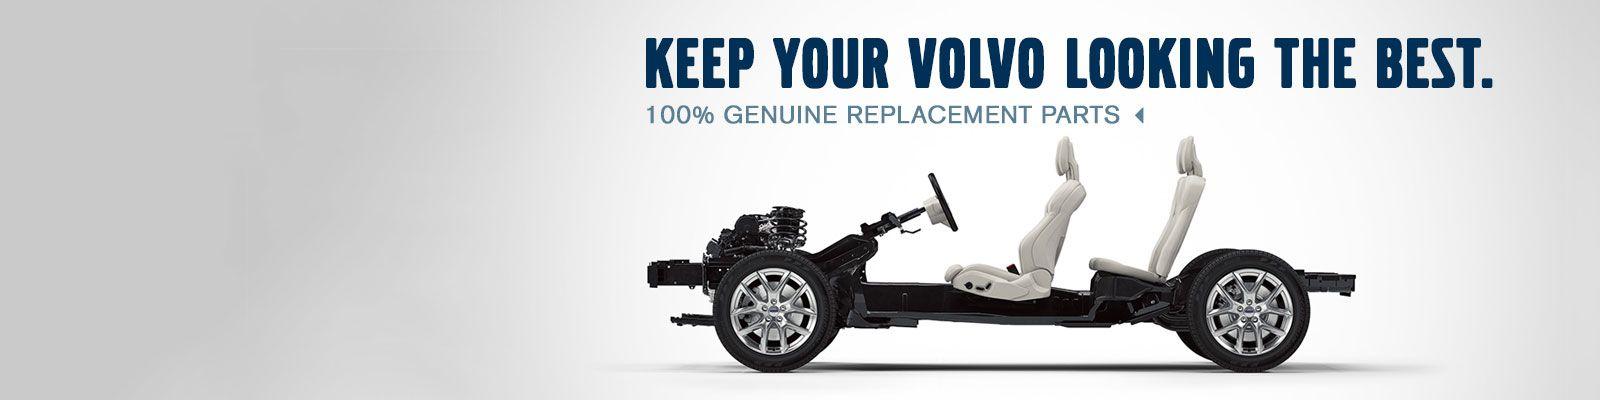 OEM Volvo Parts